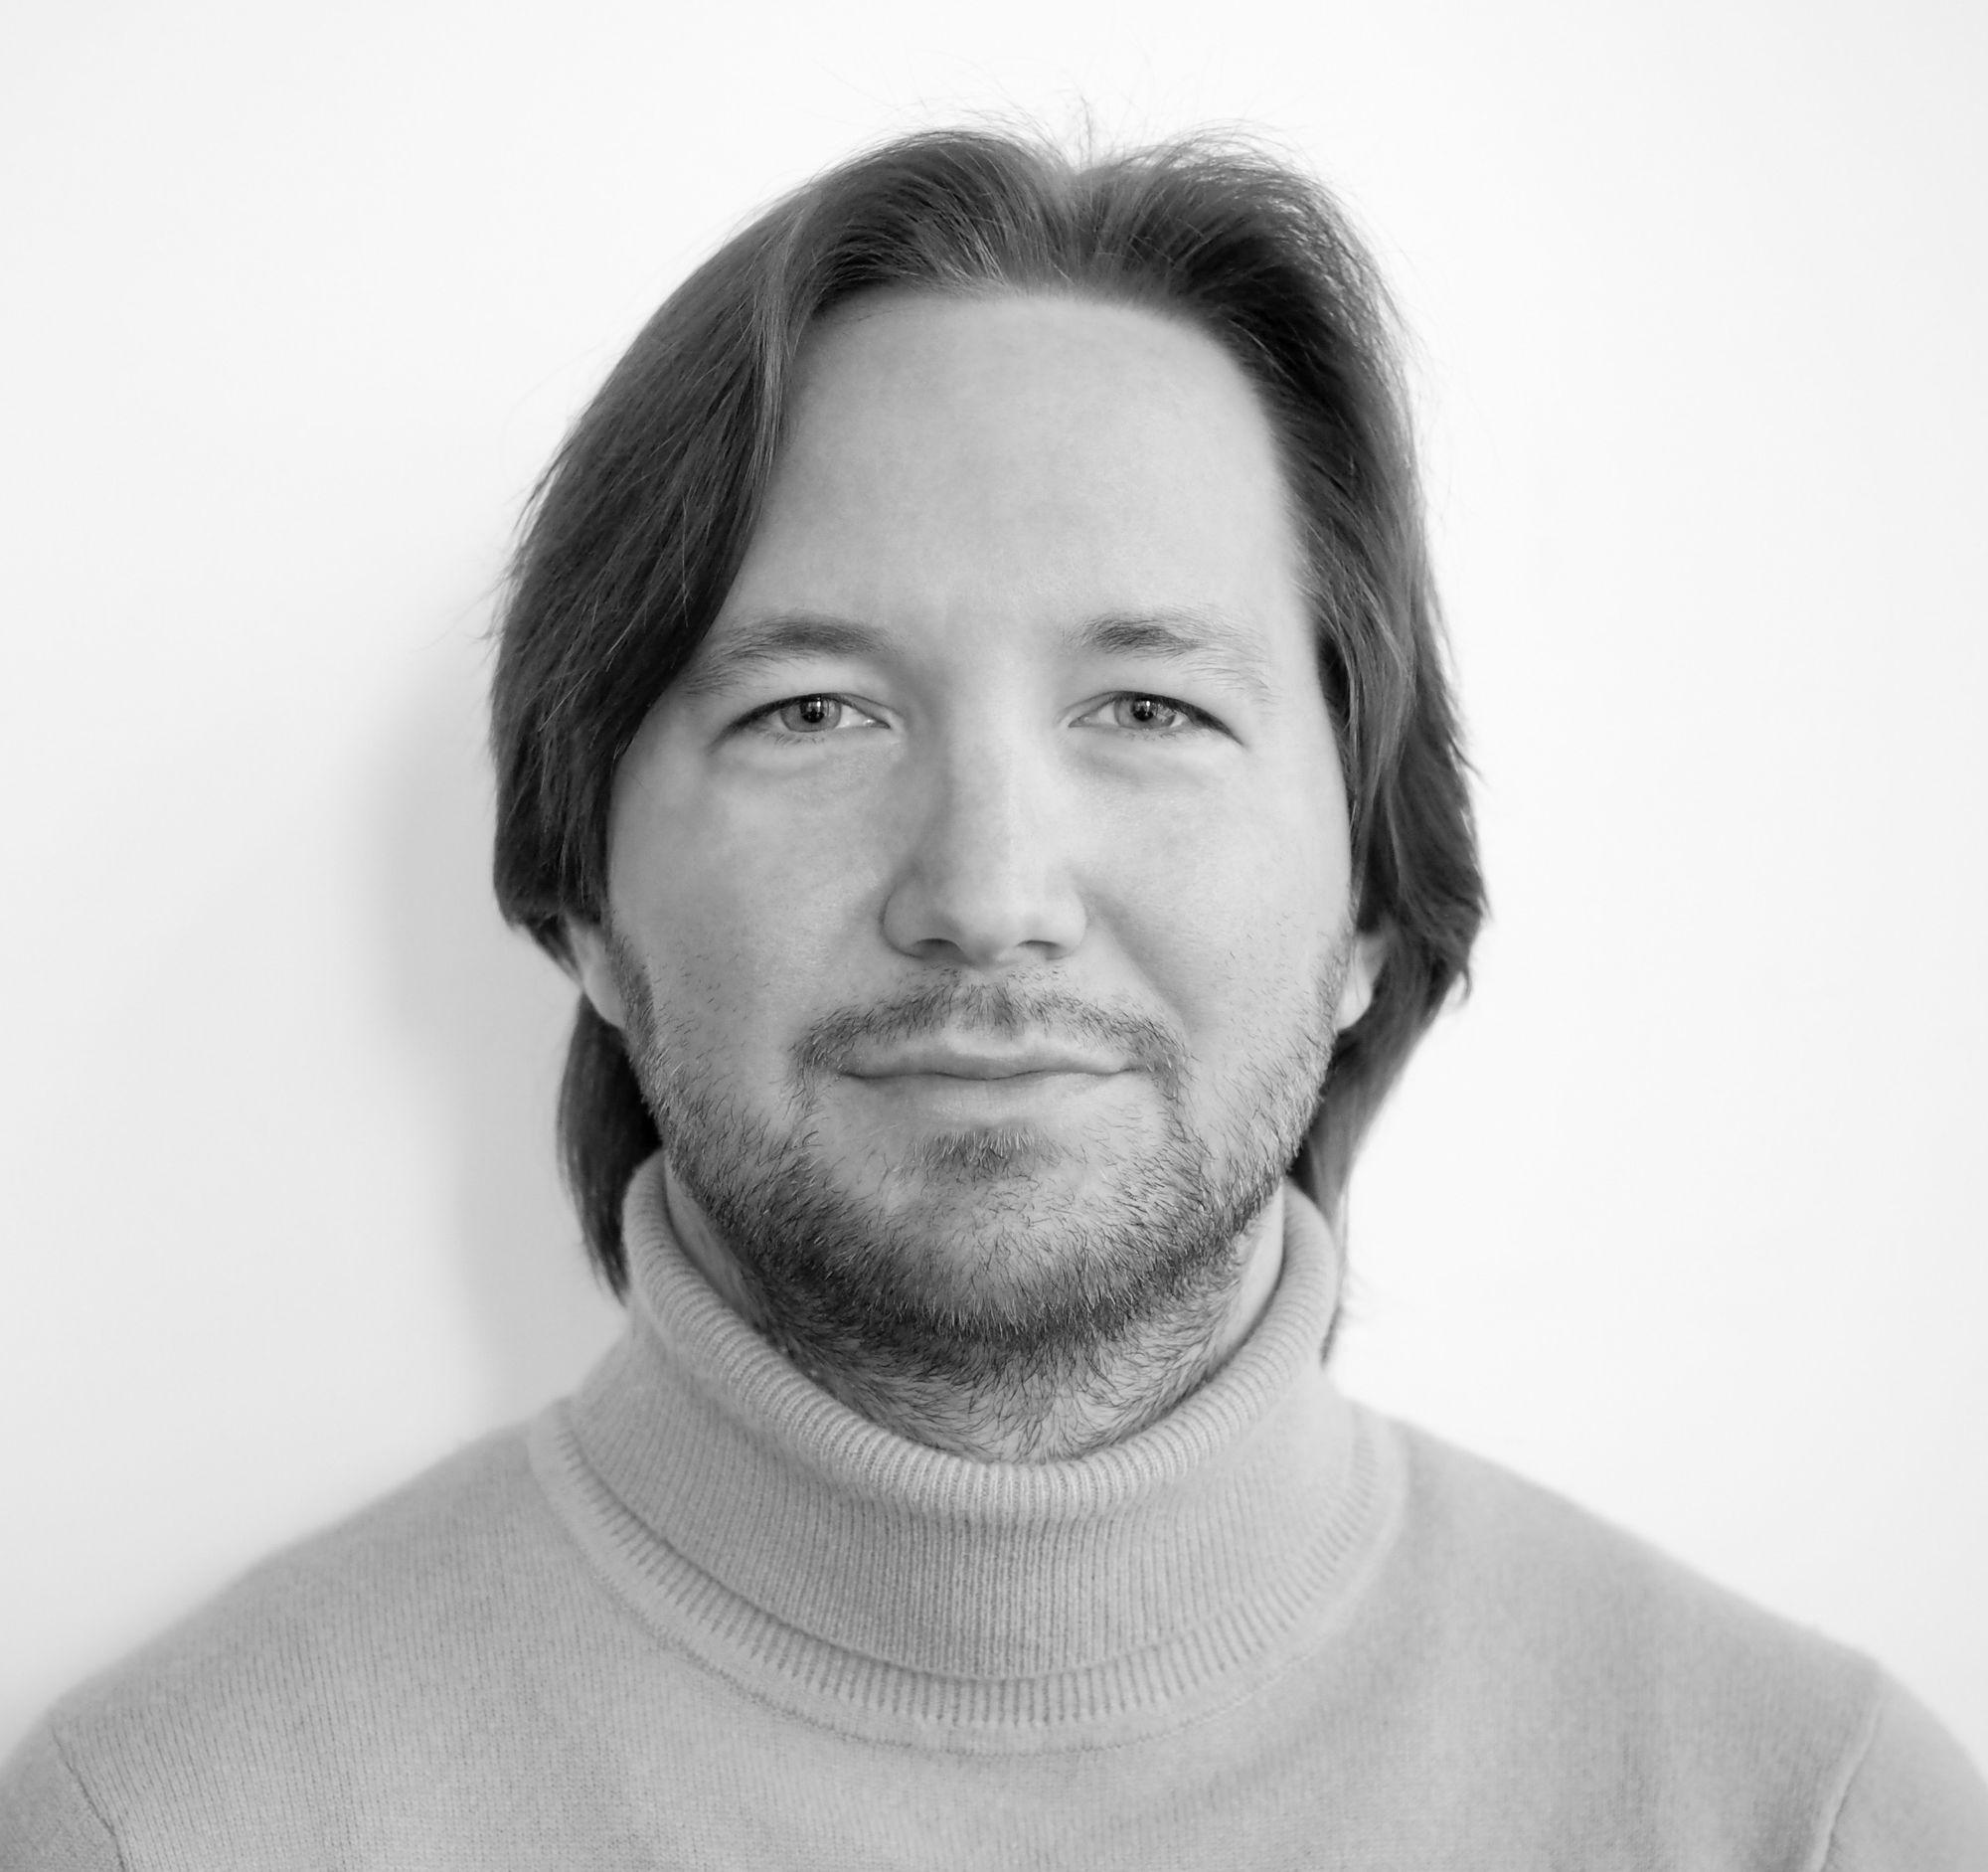 Markus Porvari